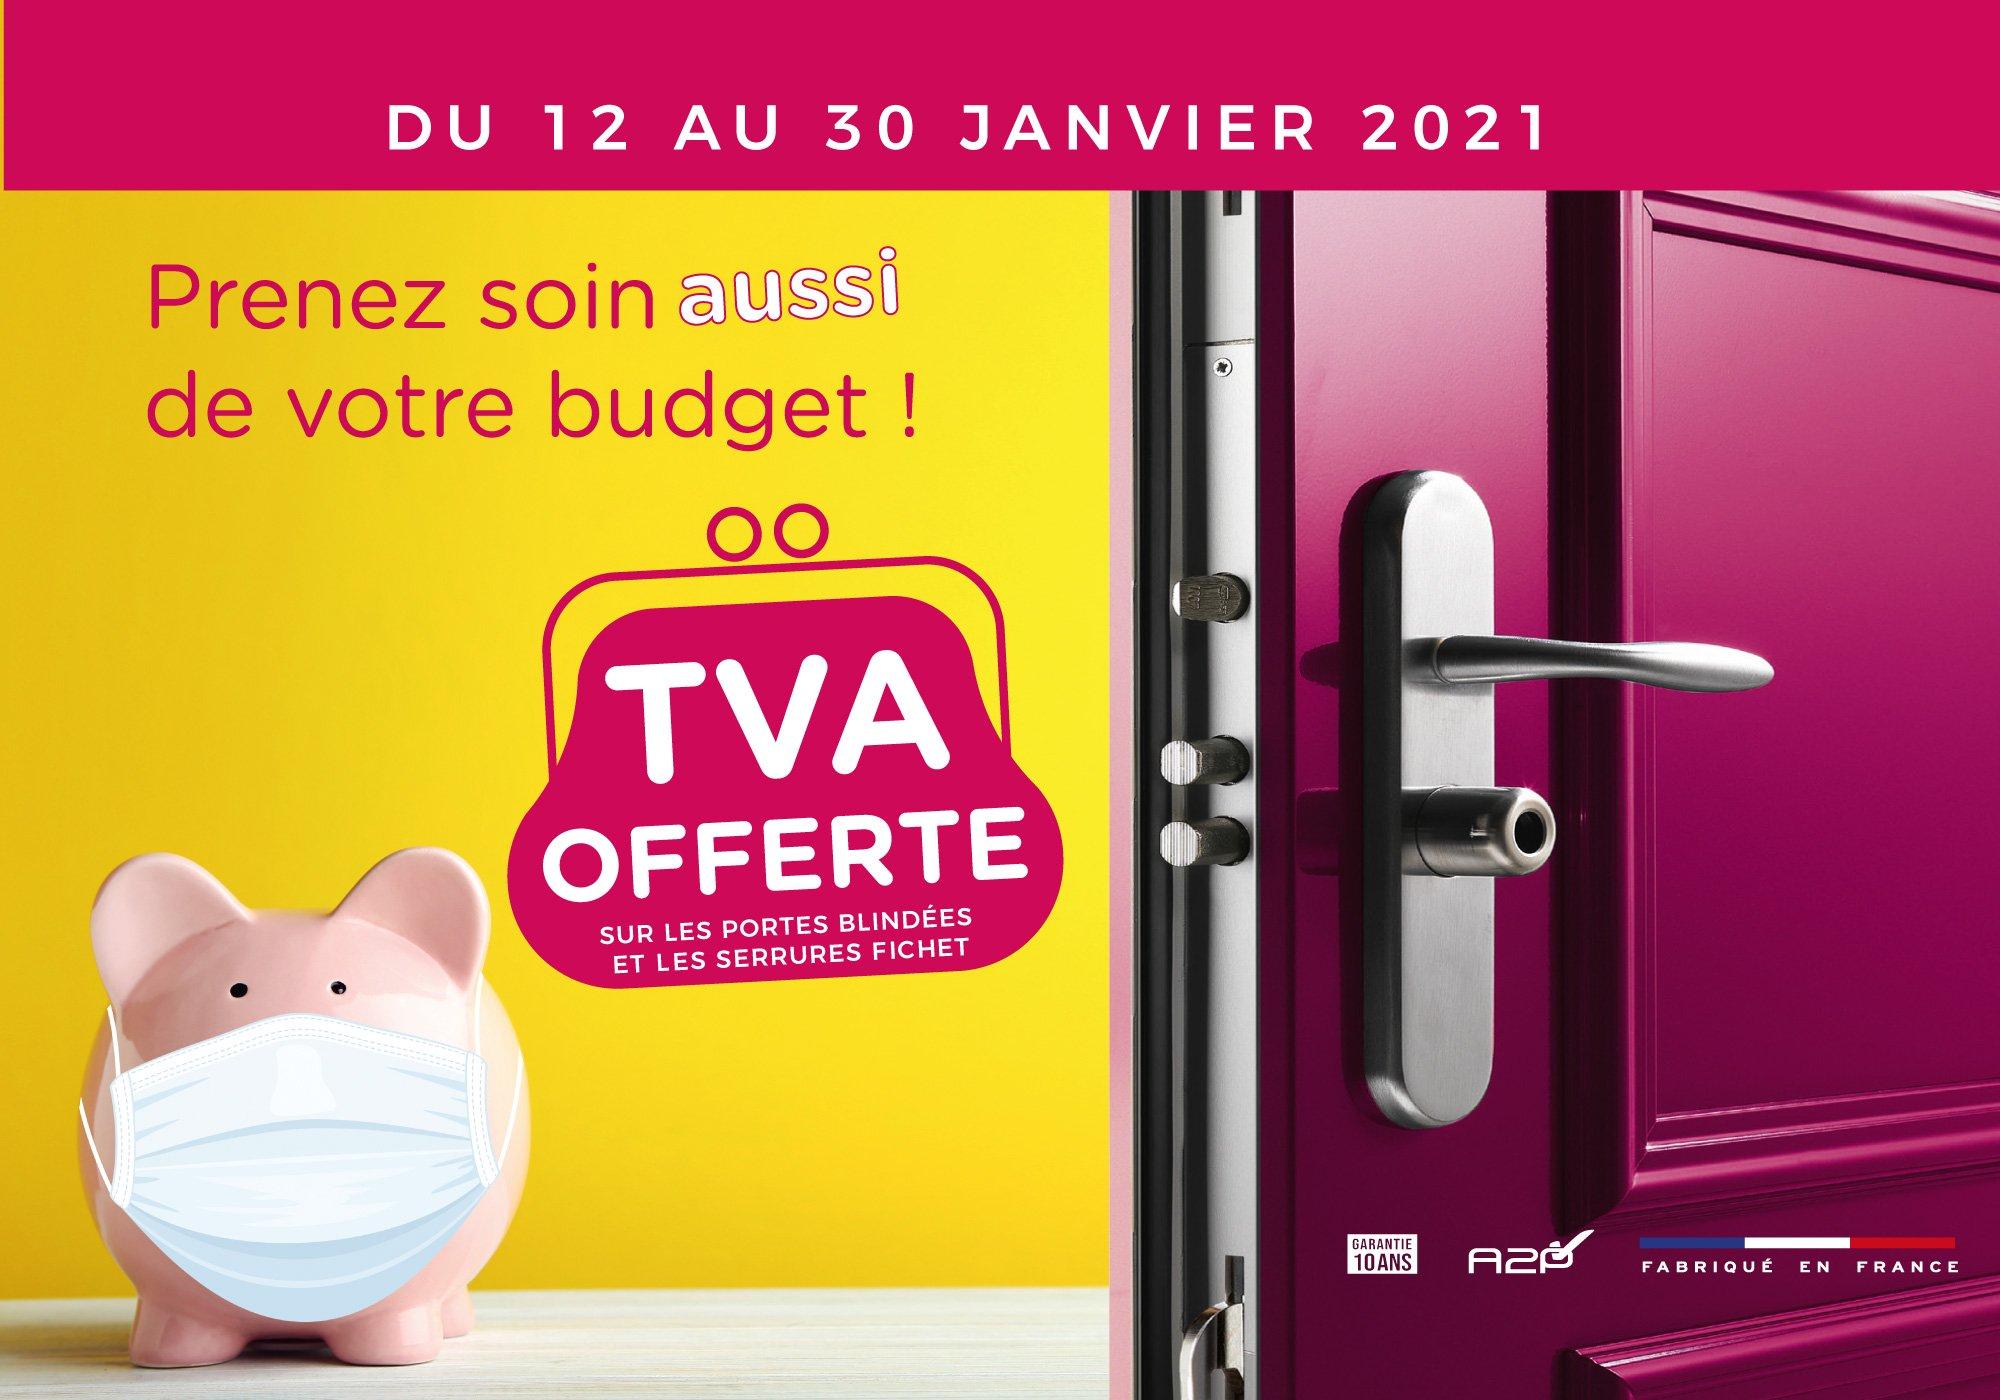 TVA offerte du 12 au 30 janvier 2021